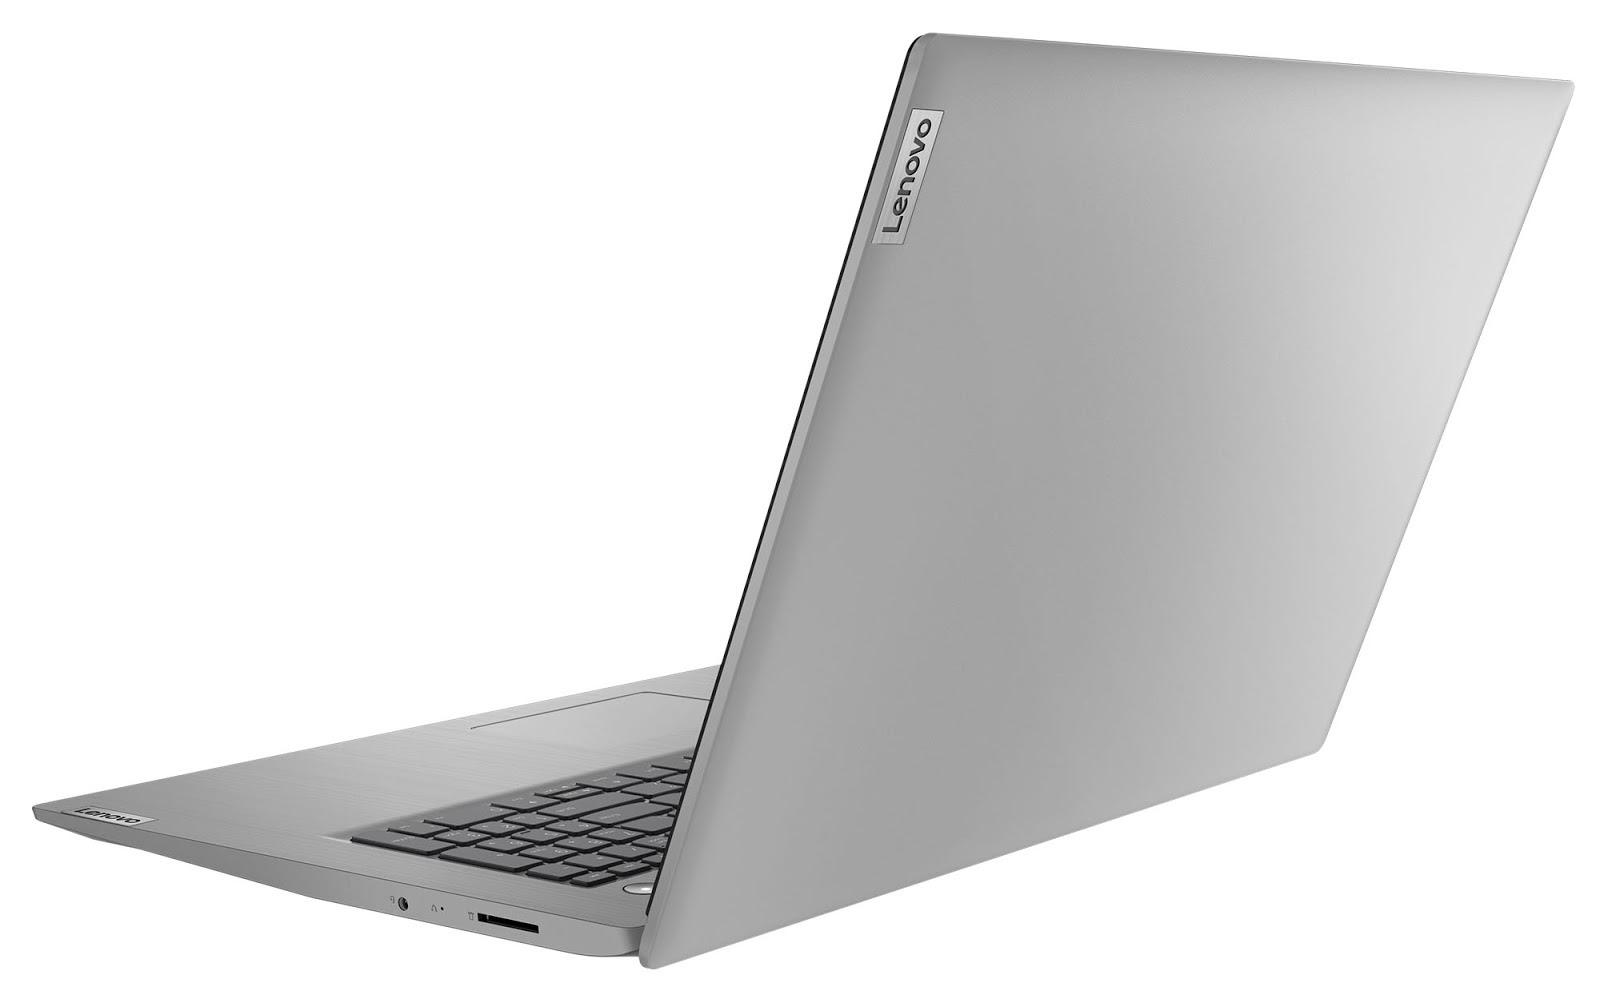 Фото 1. Ноутбук Lenovo ideapad 3 15IIL05 Platinum Grey (81WE00NYRE)